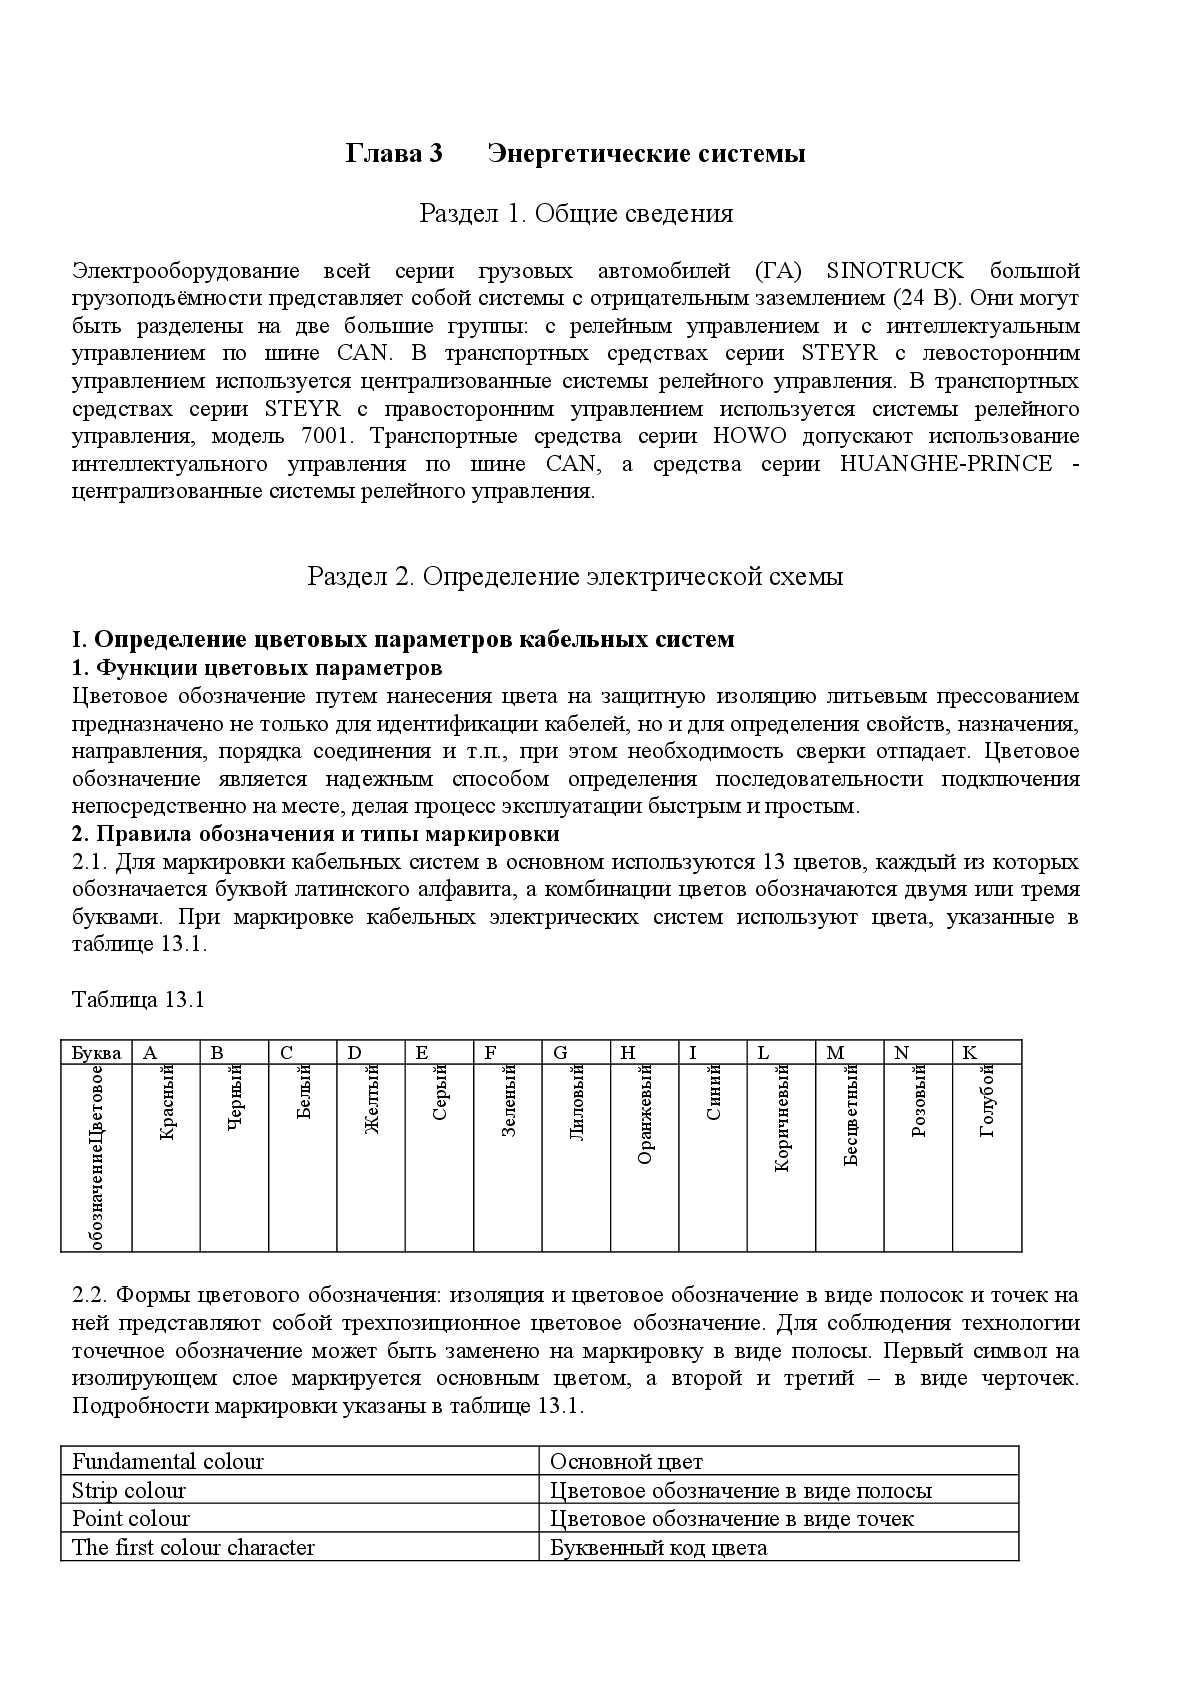 расшифровка радио обозначений на схемах